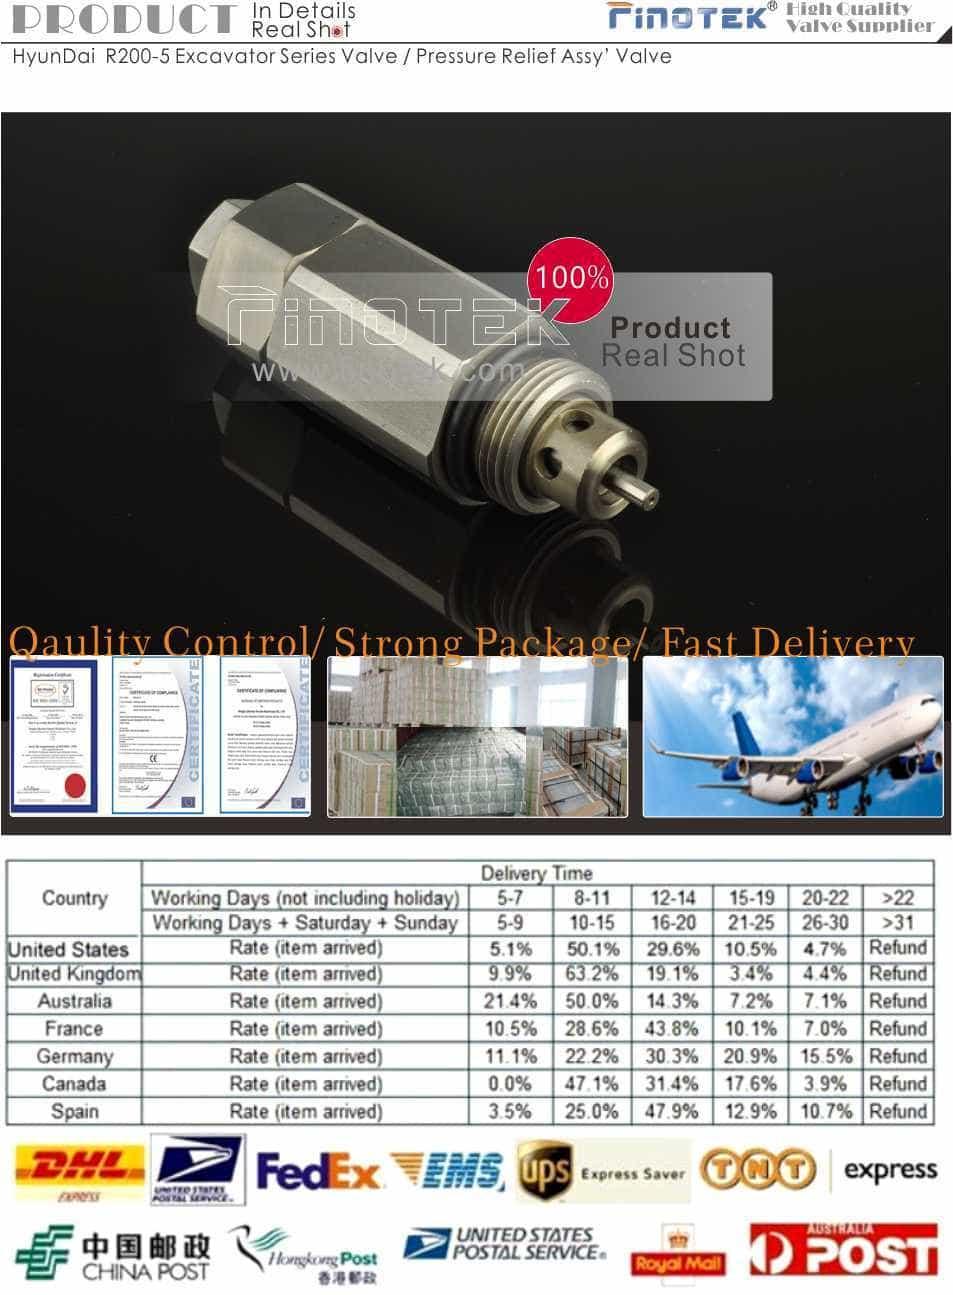 Hyundai-escavadora-Valve-R210-5, R210-6 válvula de controlo principal